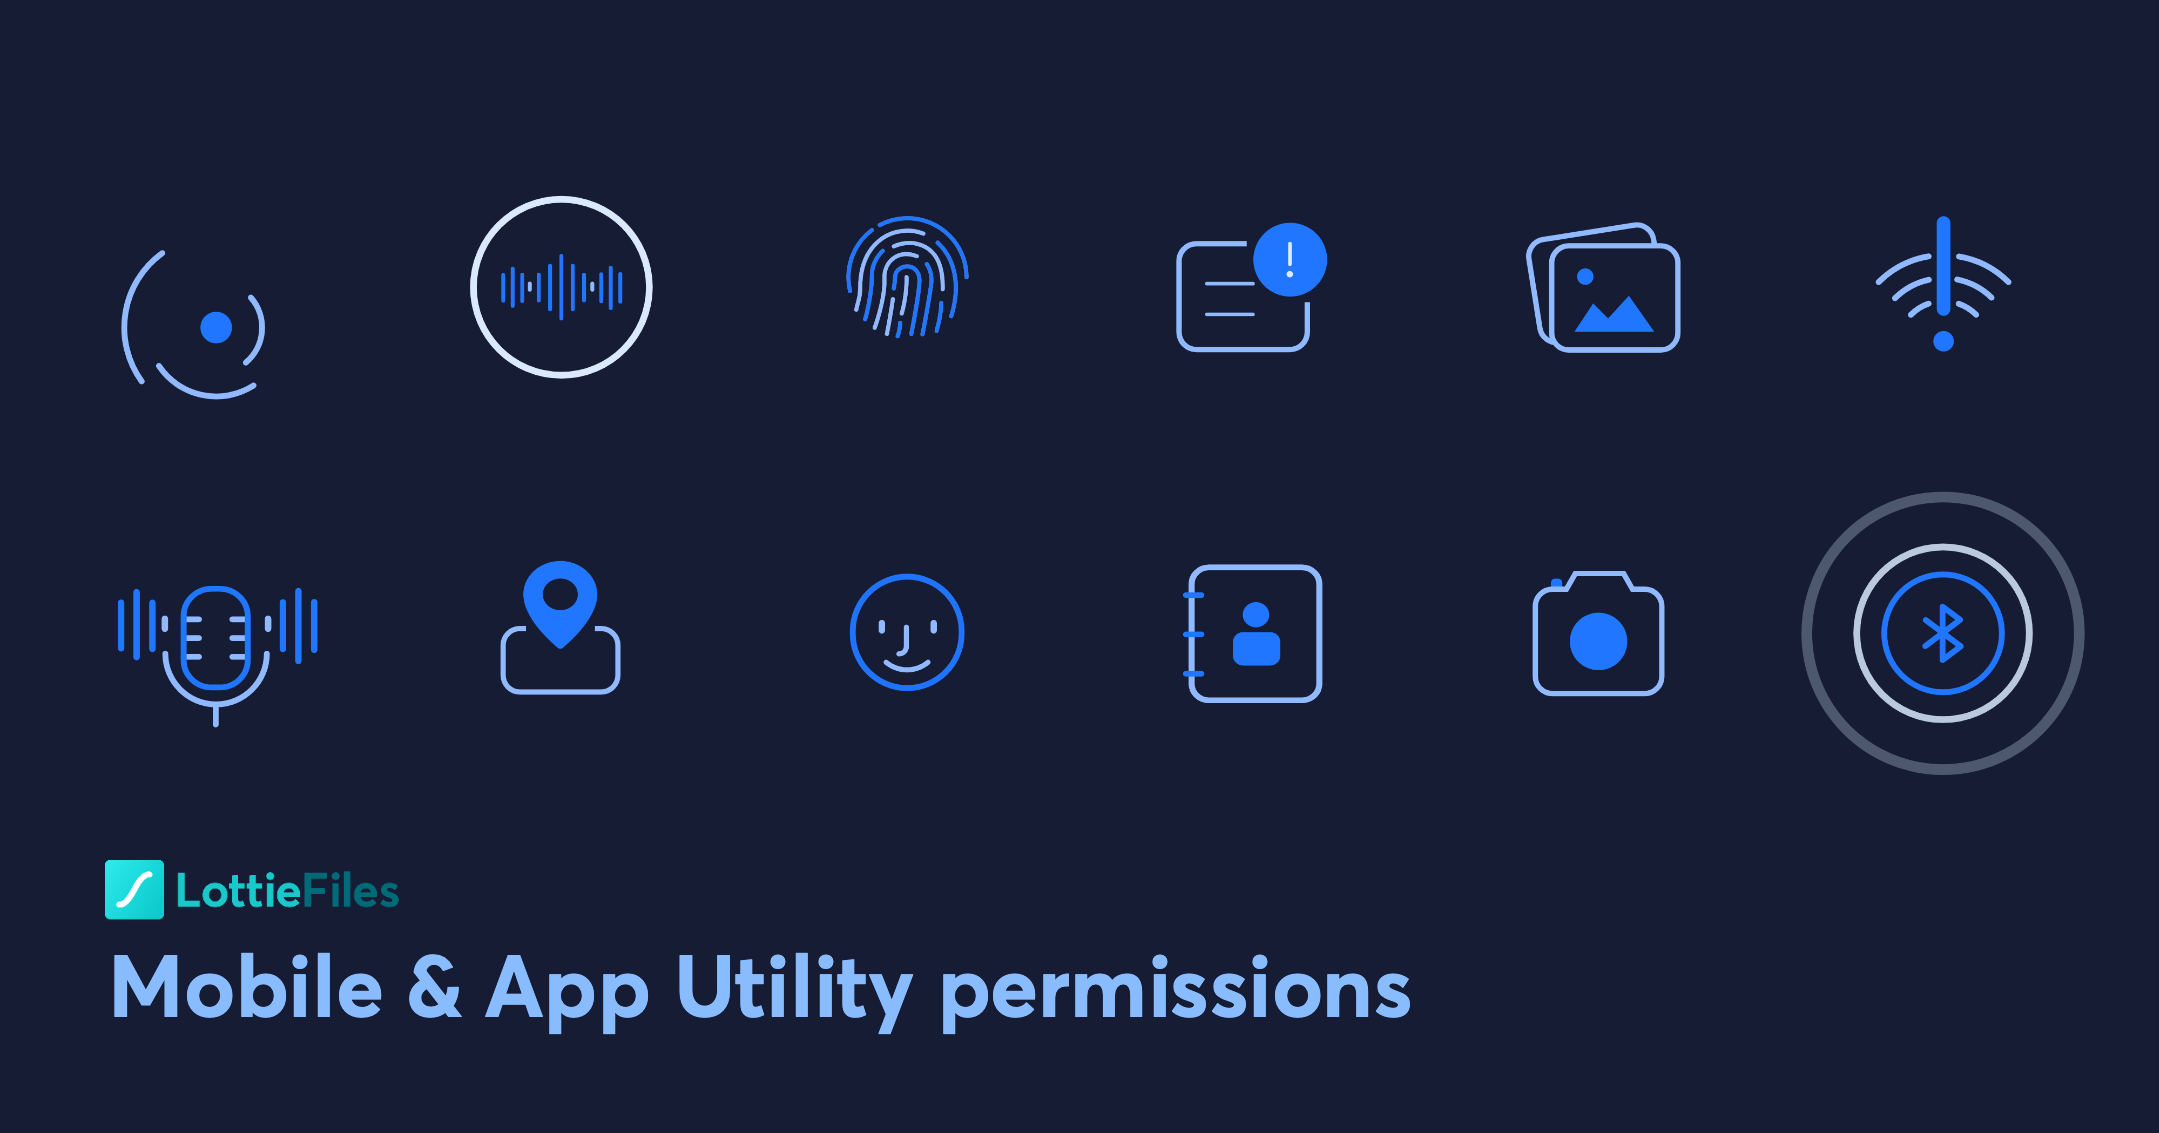 Mobile & App Utility permissions - LottieFiles